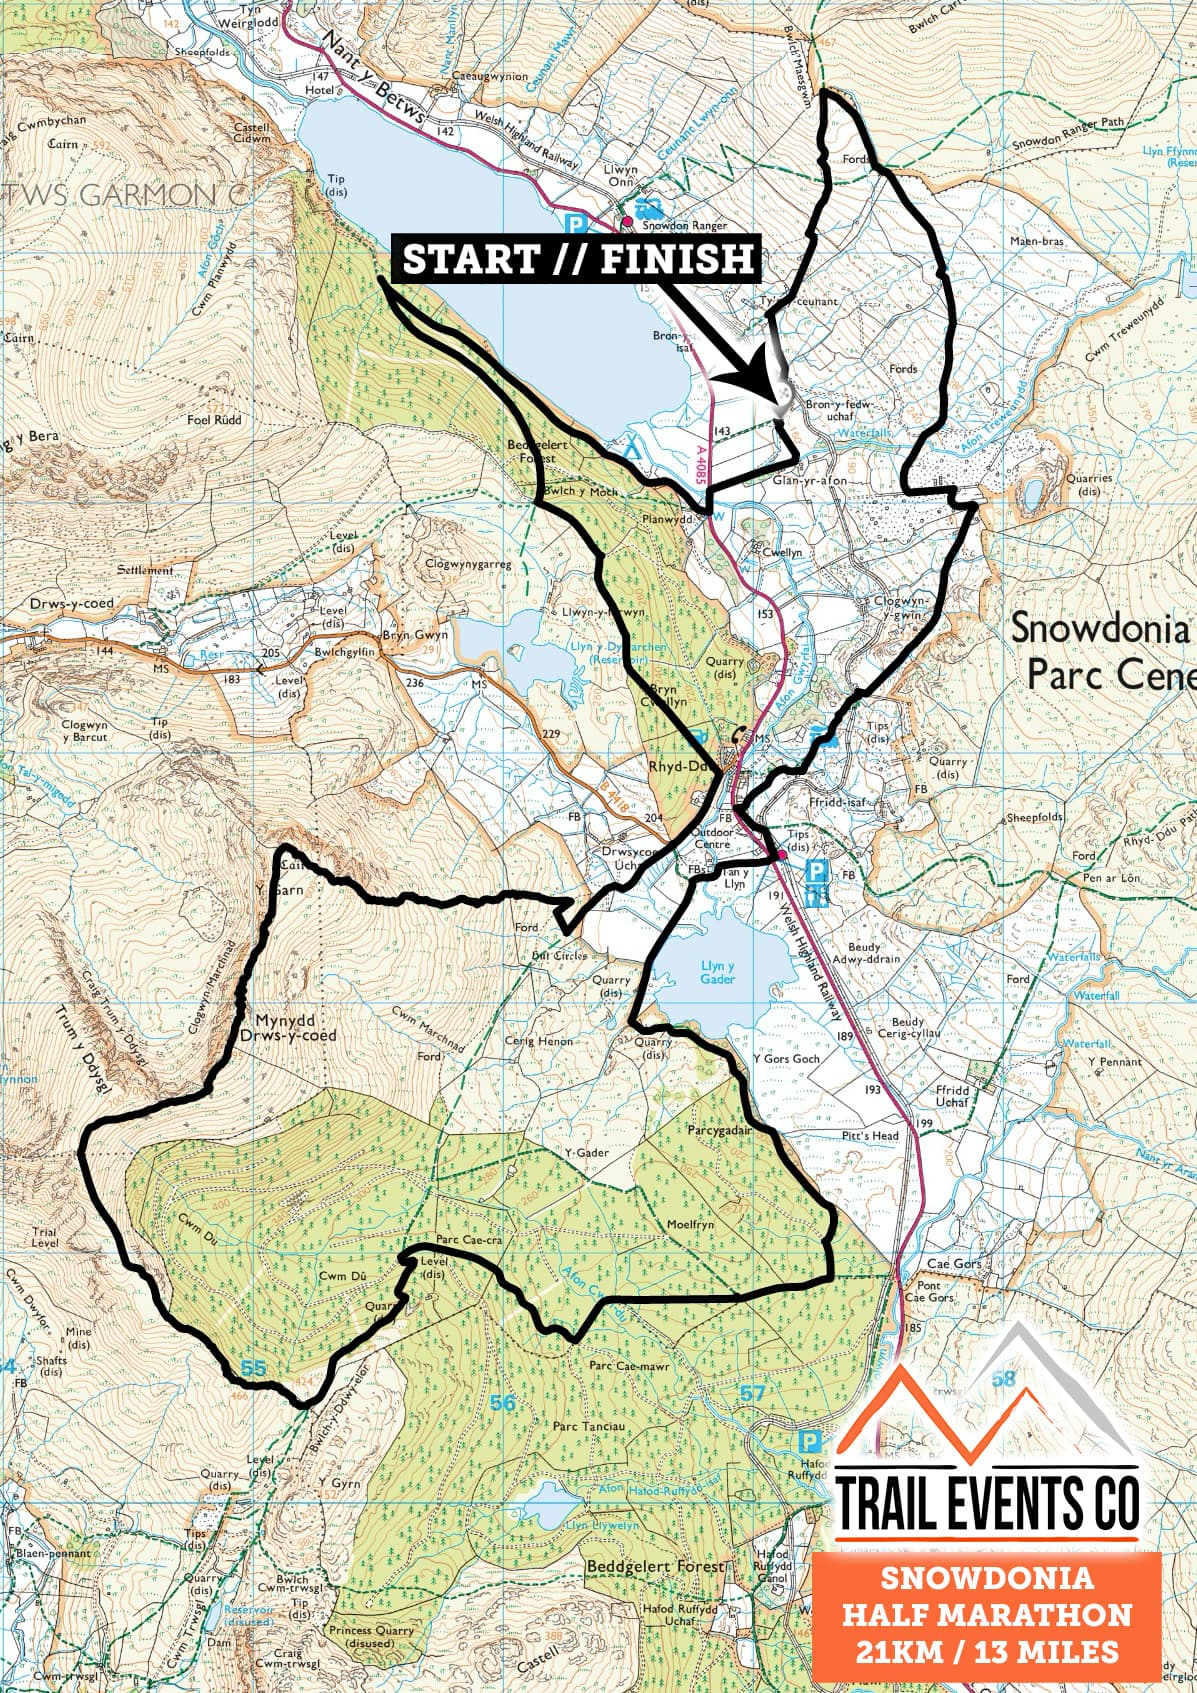 Snowdonia Half Marathon